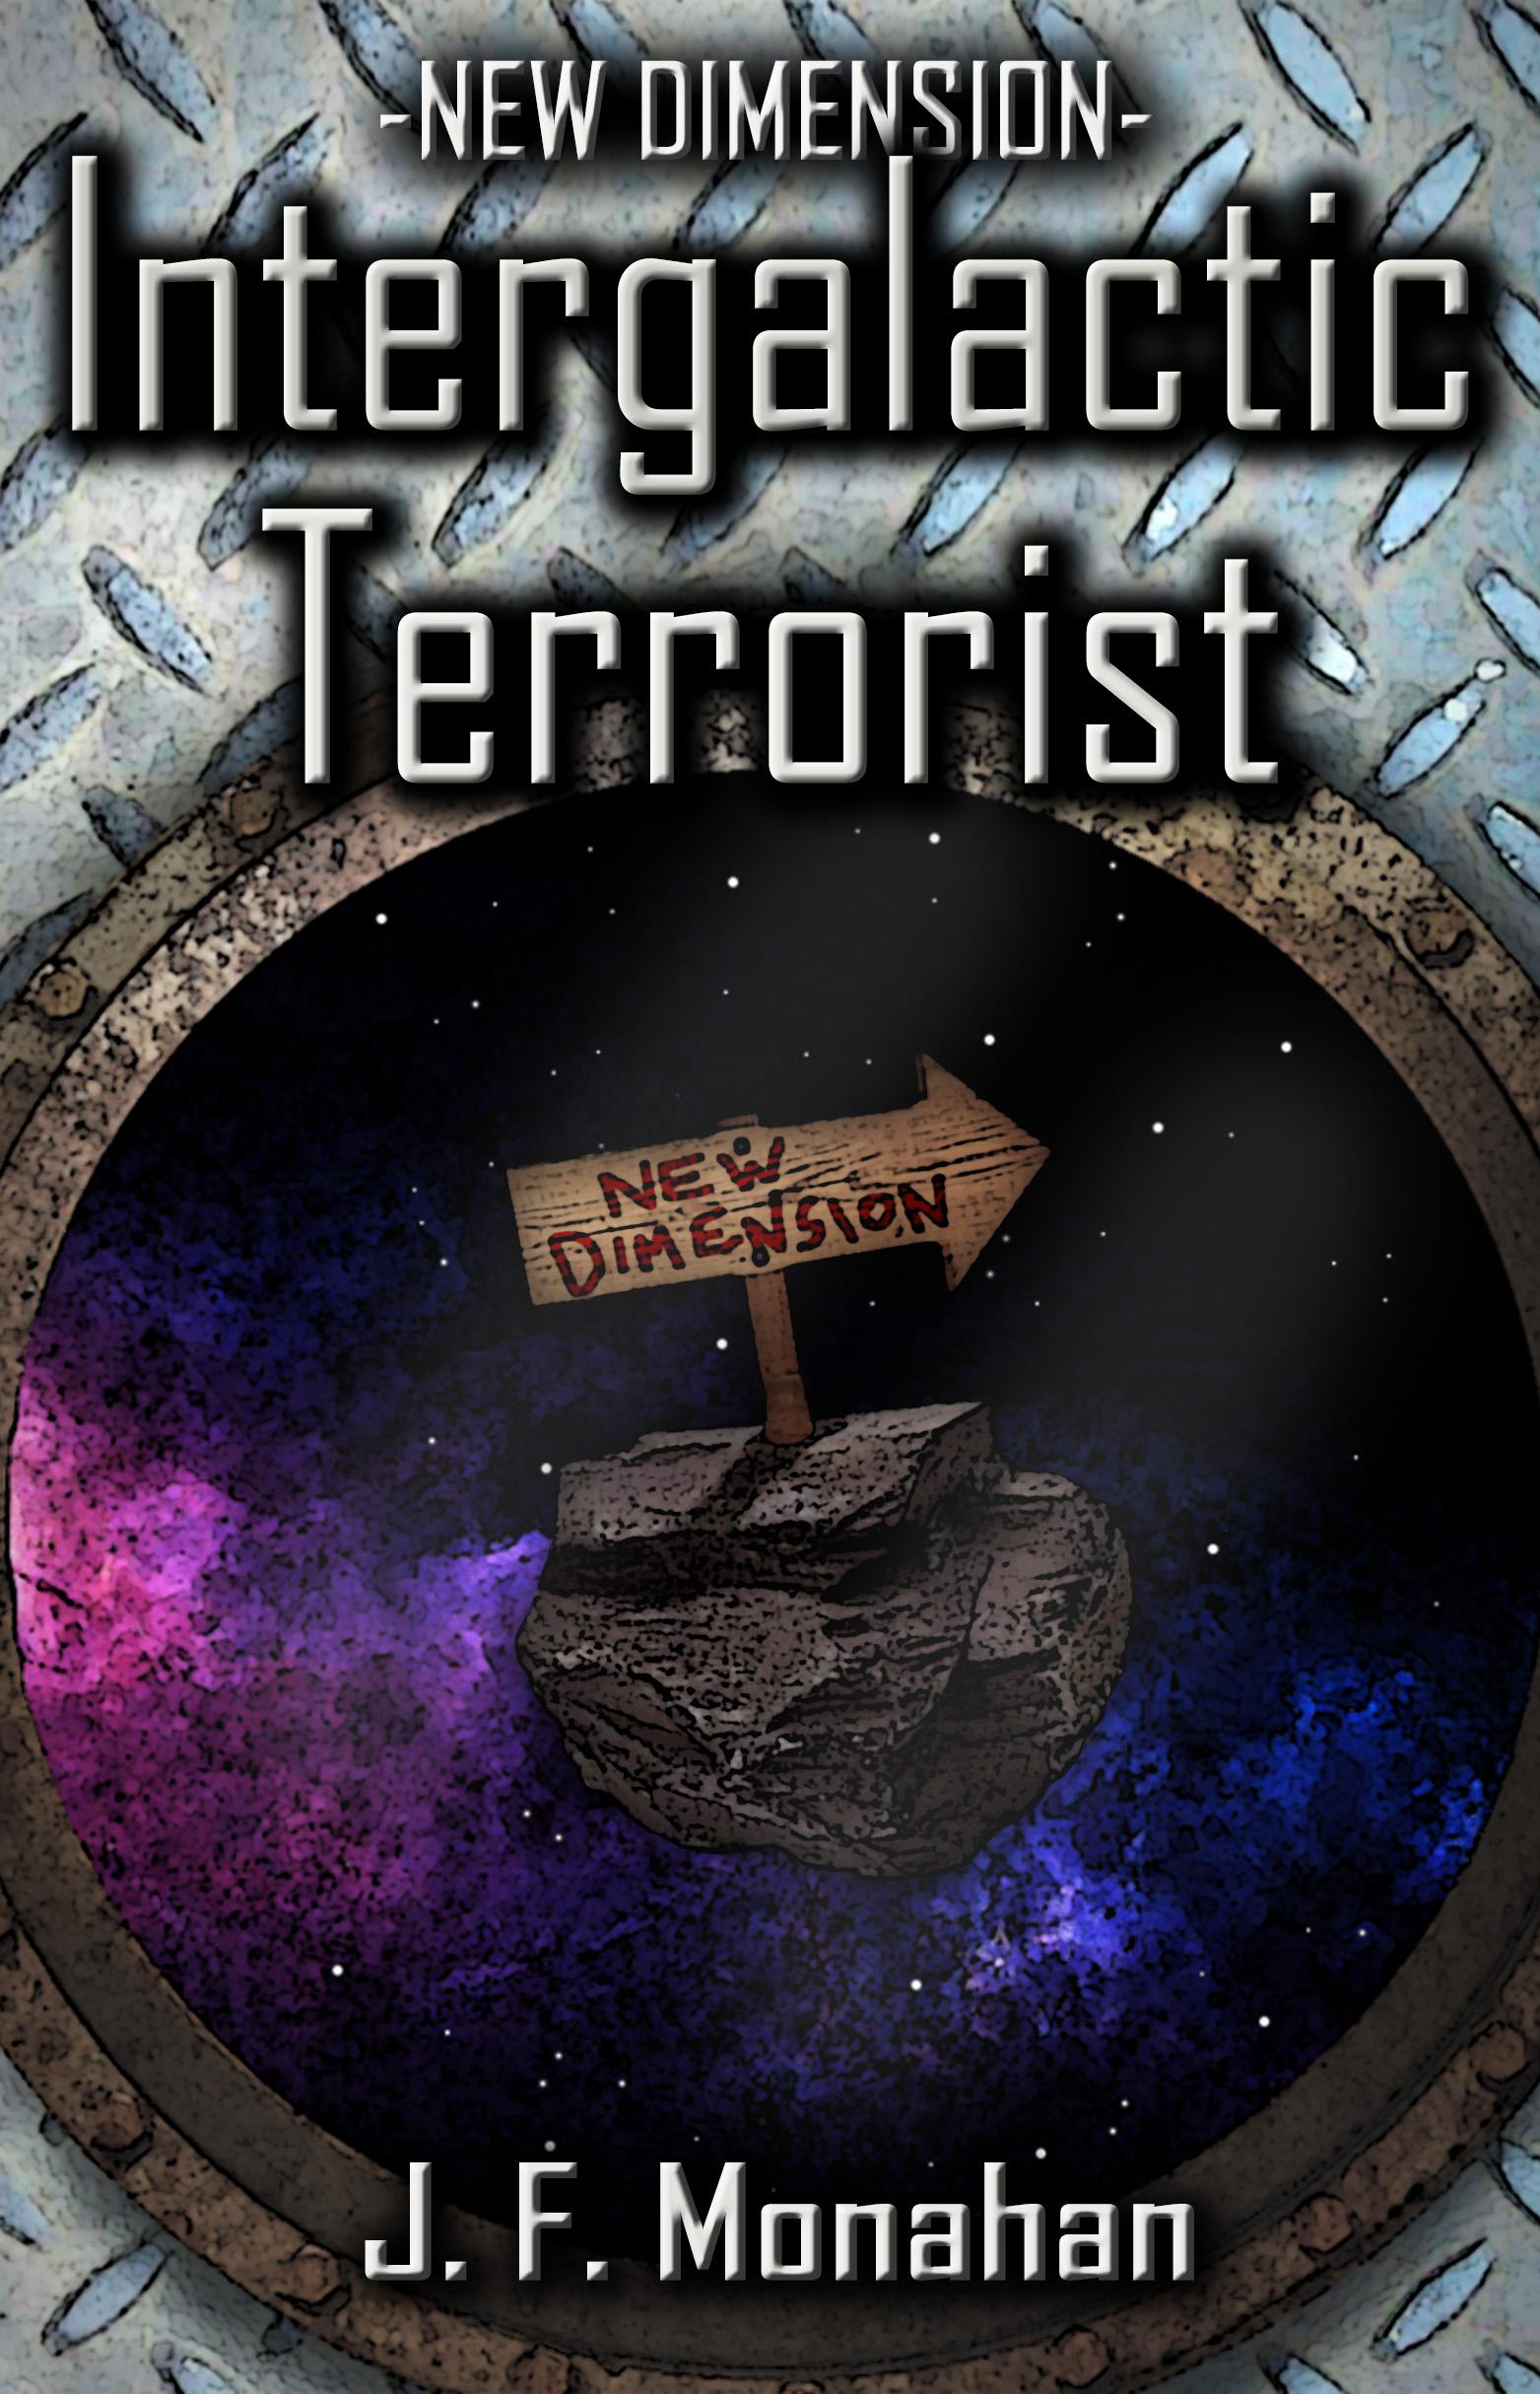 Intergalactic Terrorist